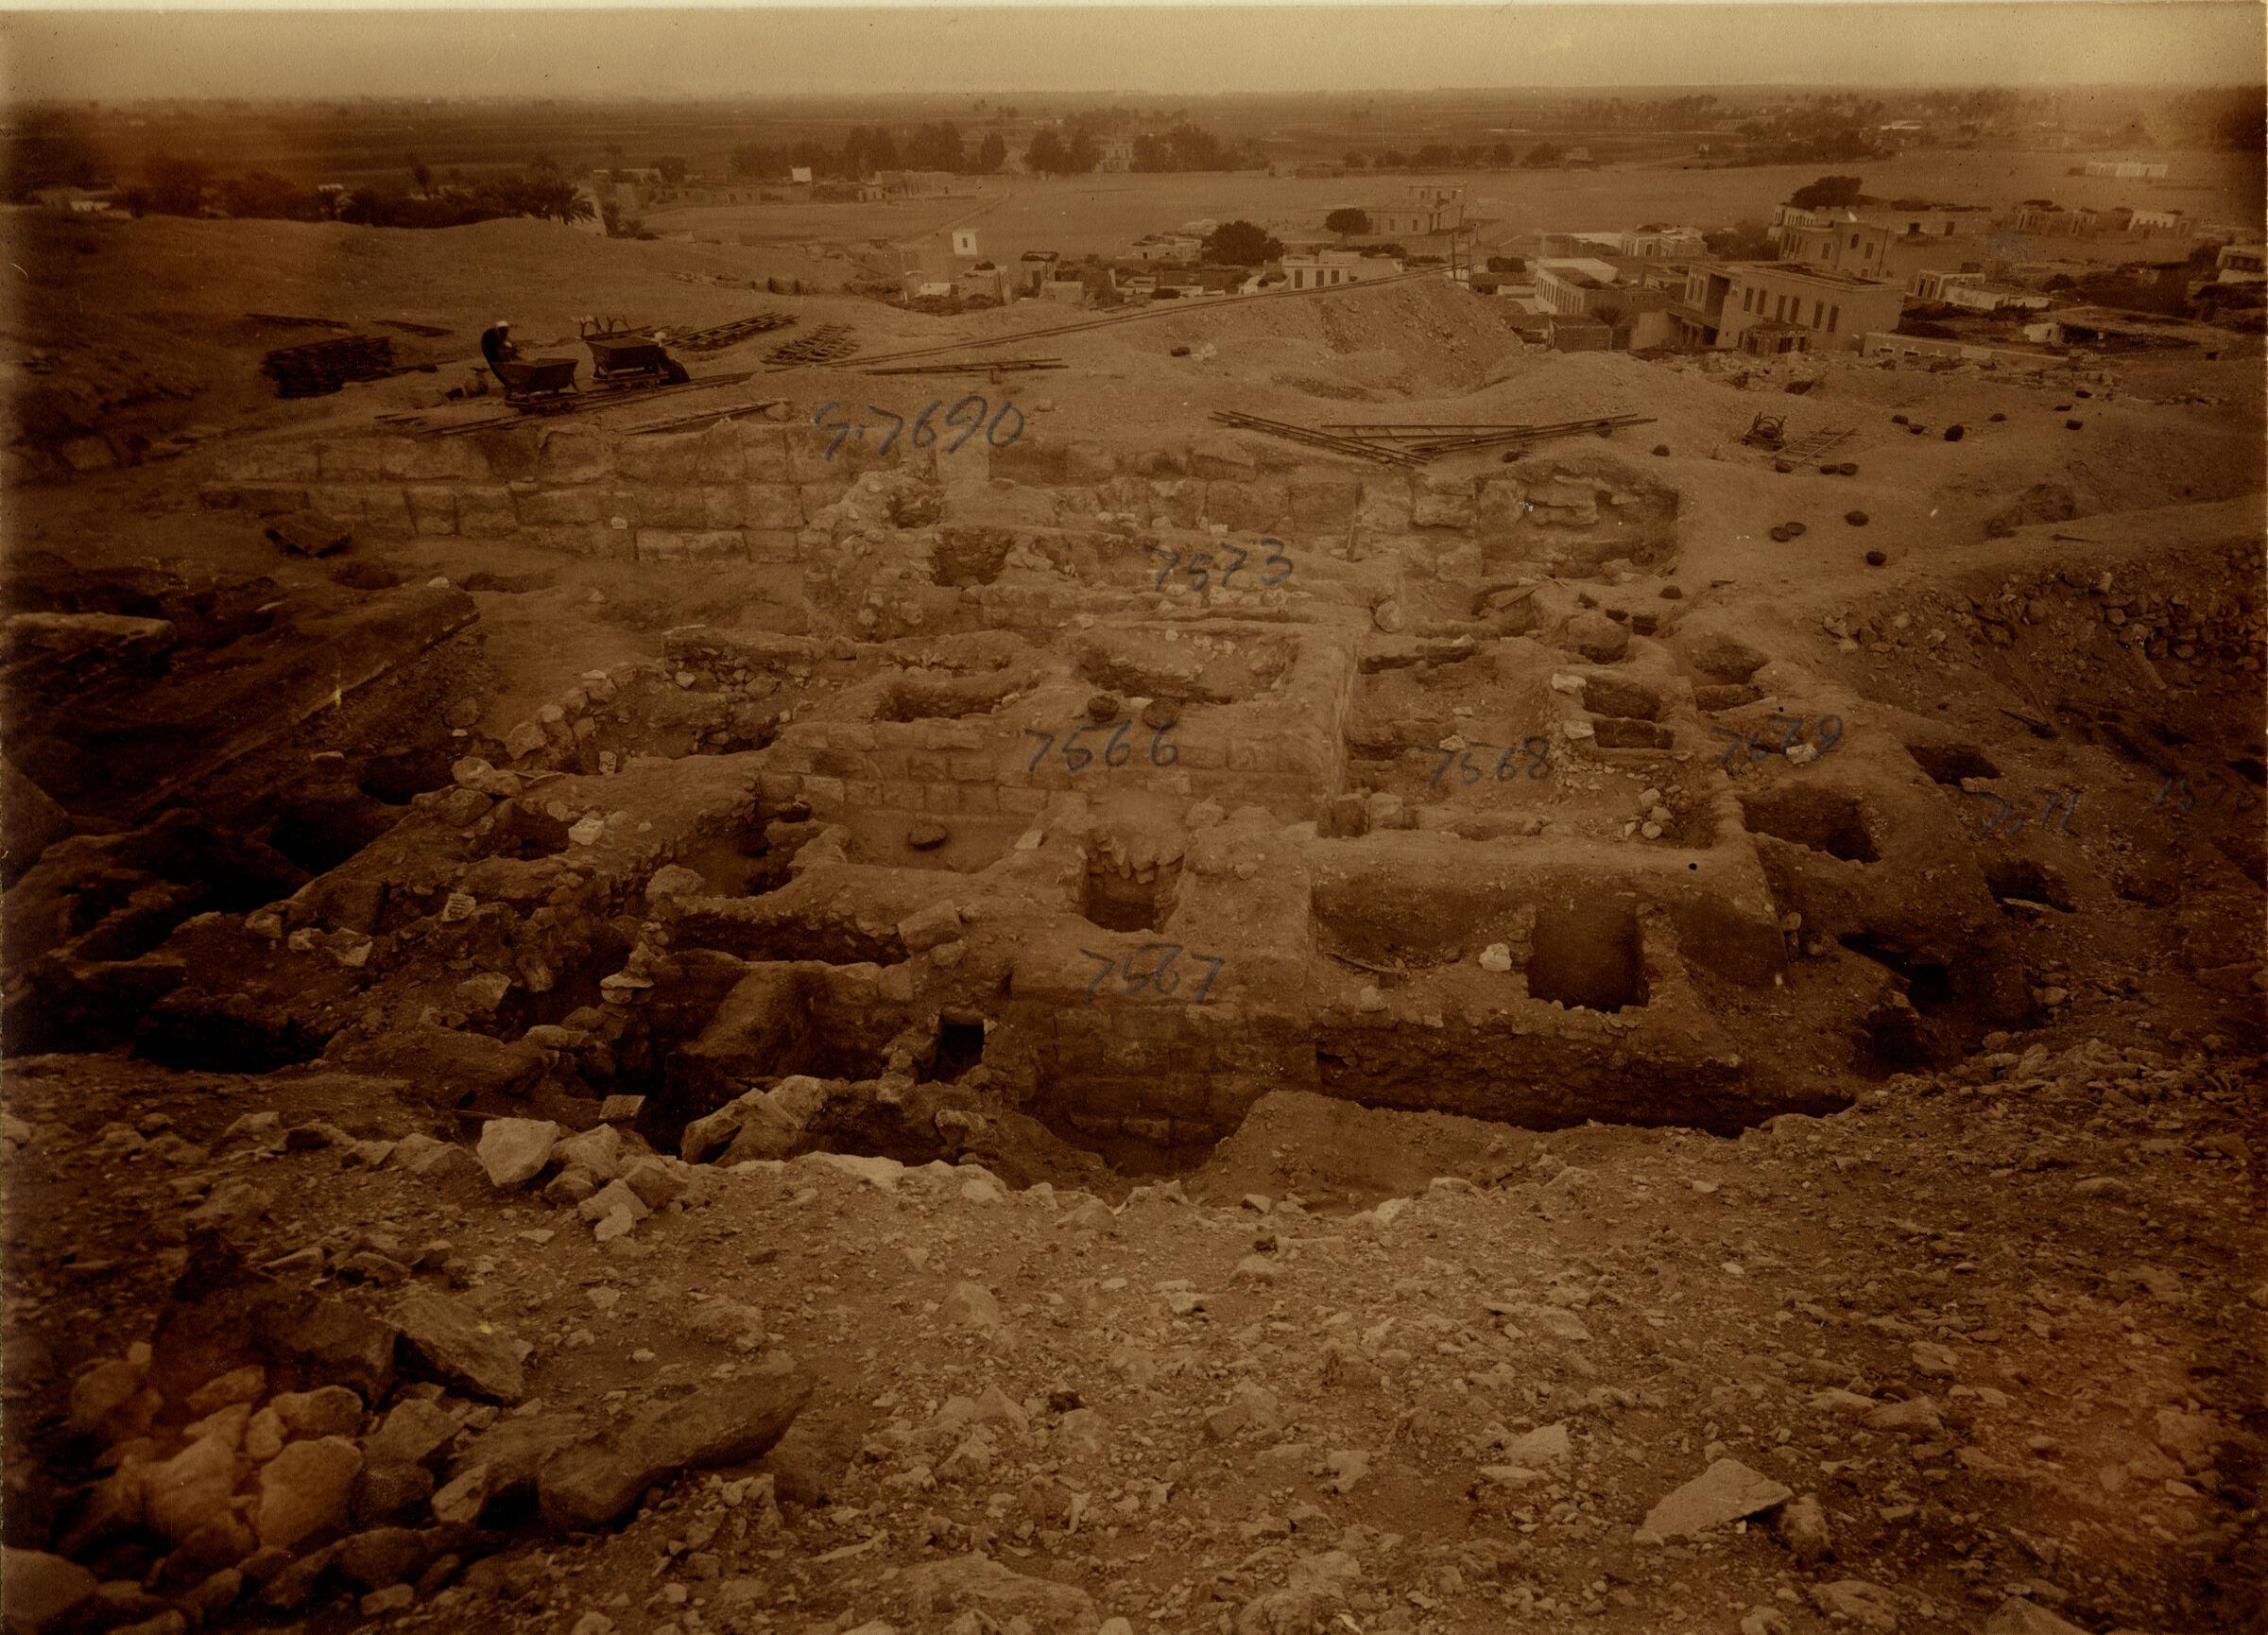 Eastern Cemetery: Site: Giza; View: G 7566, G 7567, G 7568, G 7569, G 7571, G 7573, G 7578, G 7690